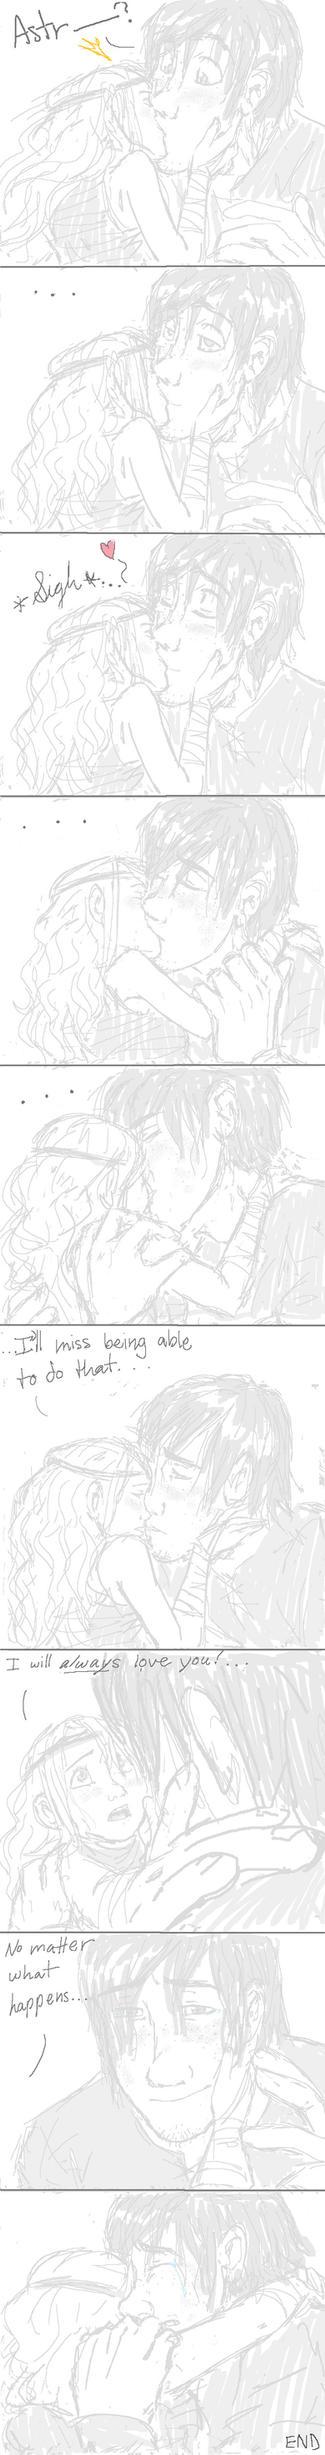 A Giant Kiss by Bonka-chan